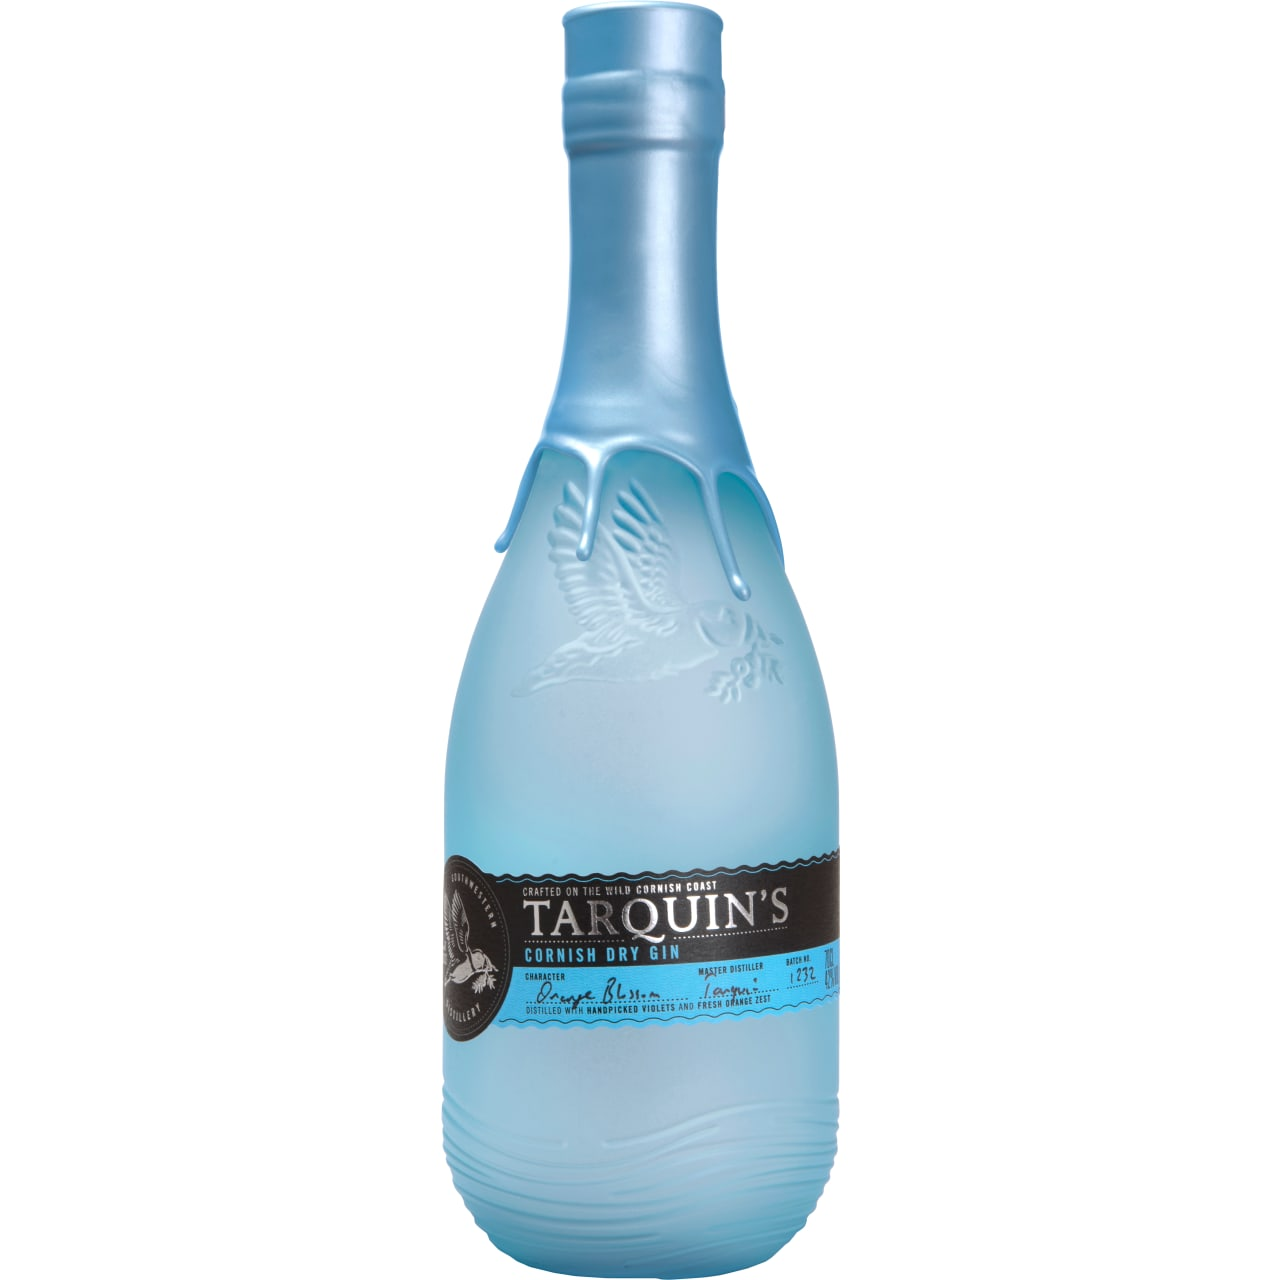 Product Image - Tarquin's Cornish Gin